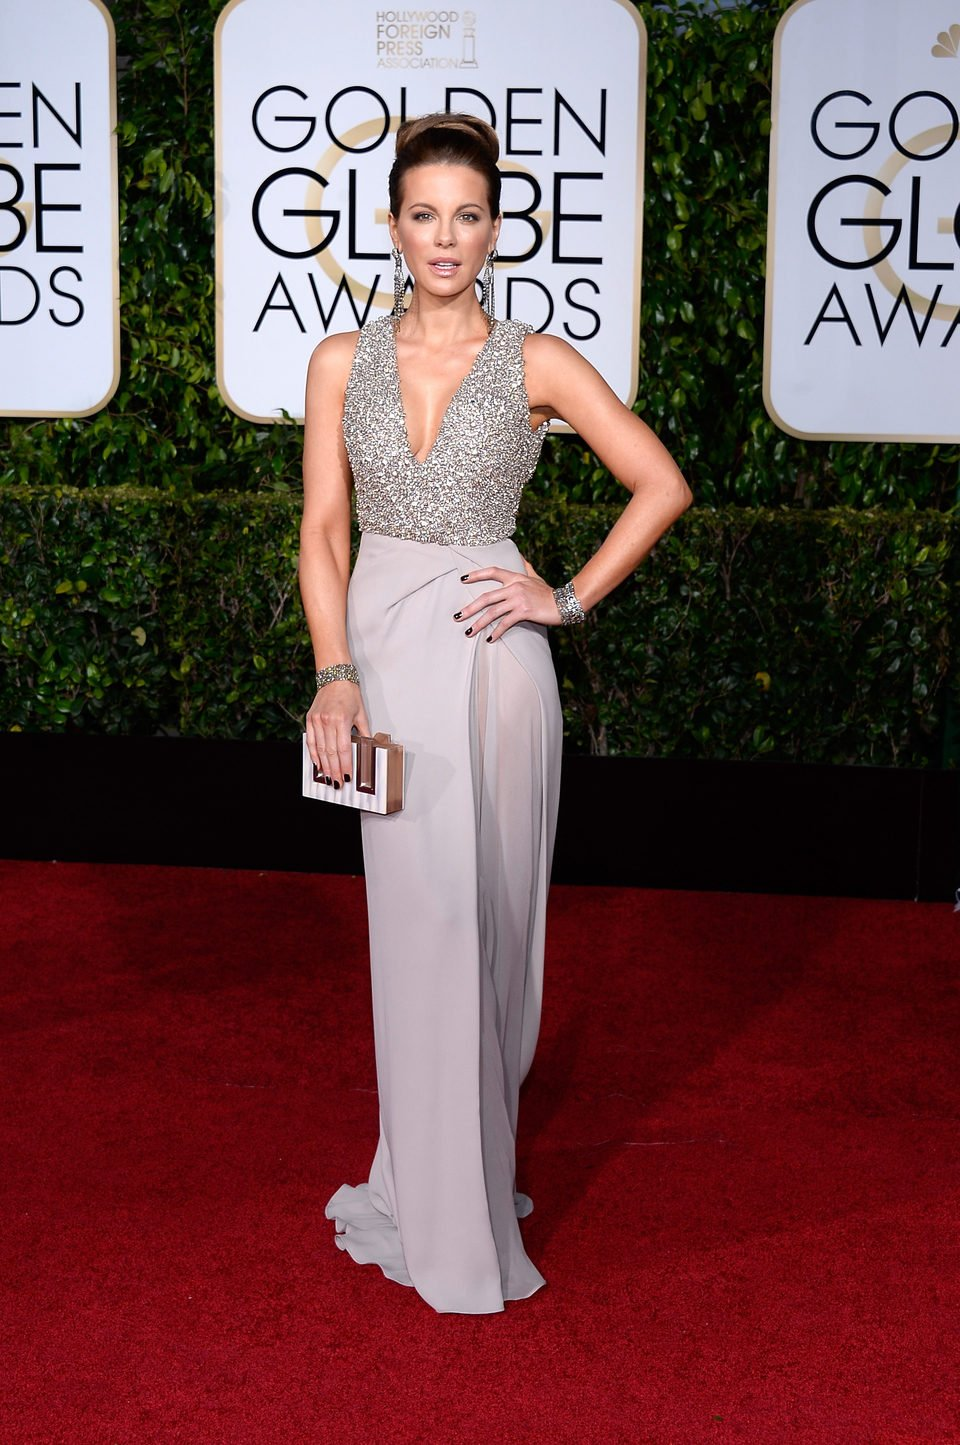 Kate Beckinsale at the Golden Globes 2015 red carpet